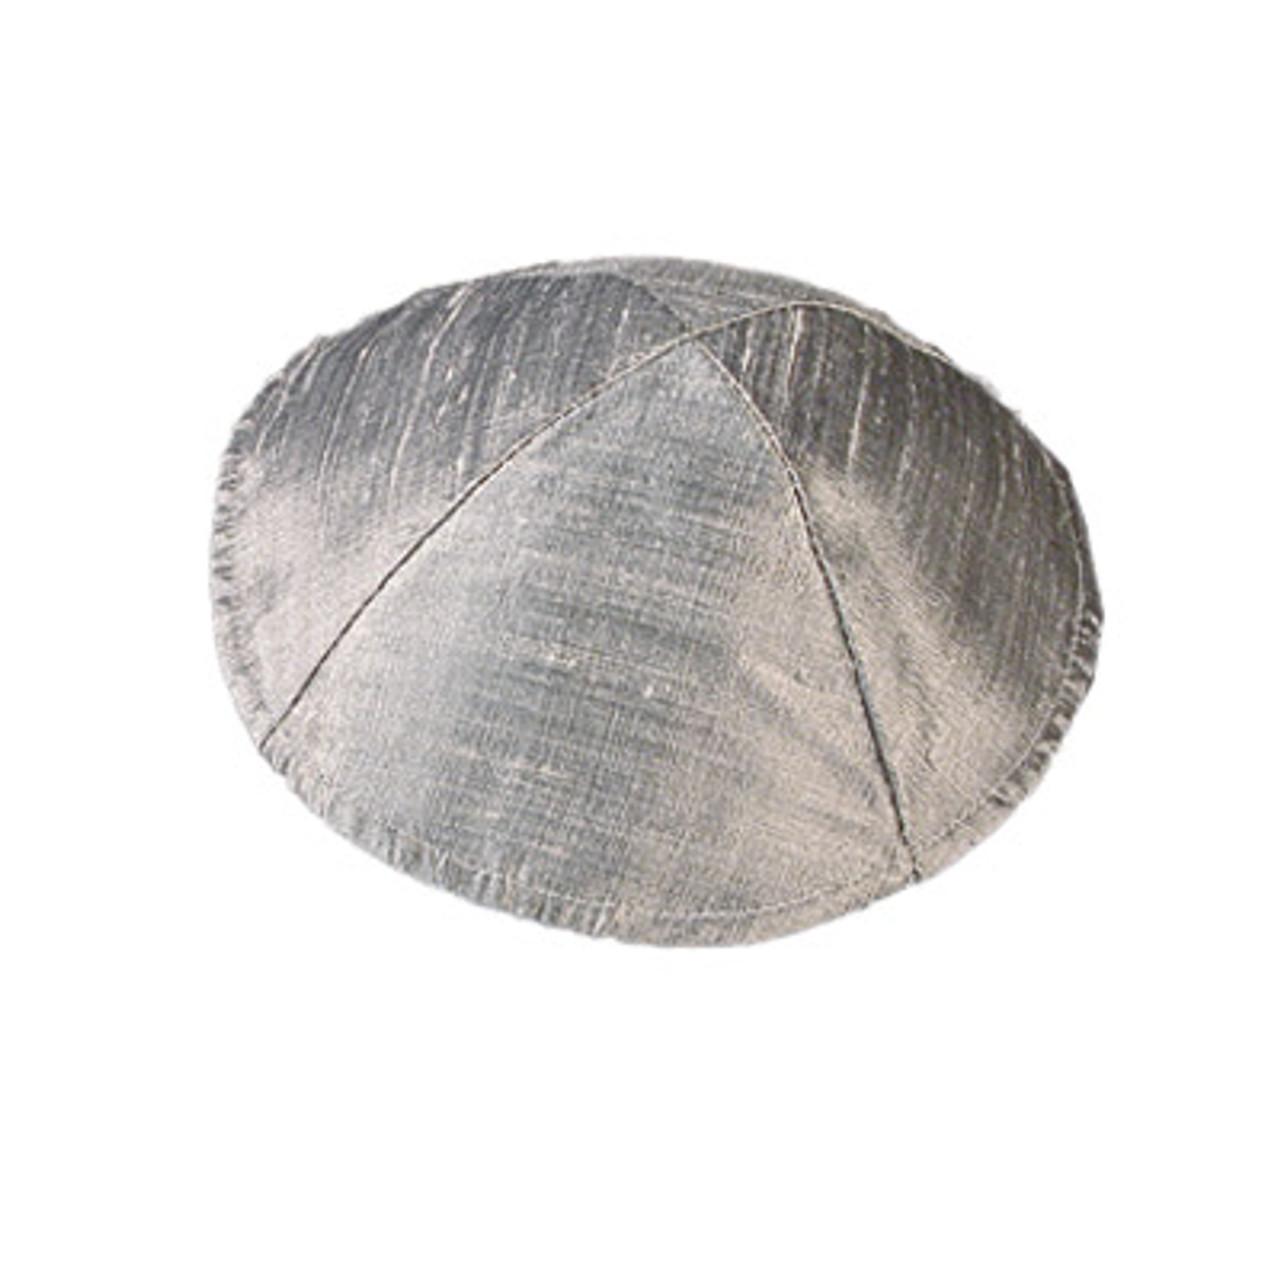 Matching Kippah - Yair Emanuel raw silk silver kippah